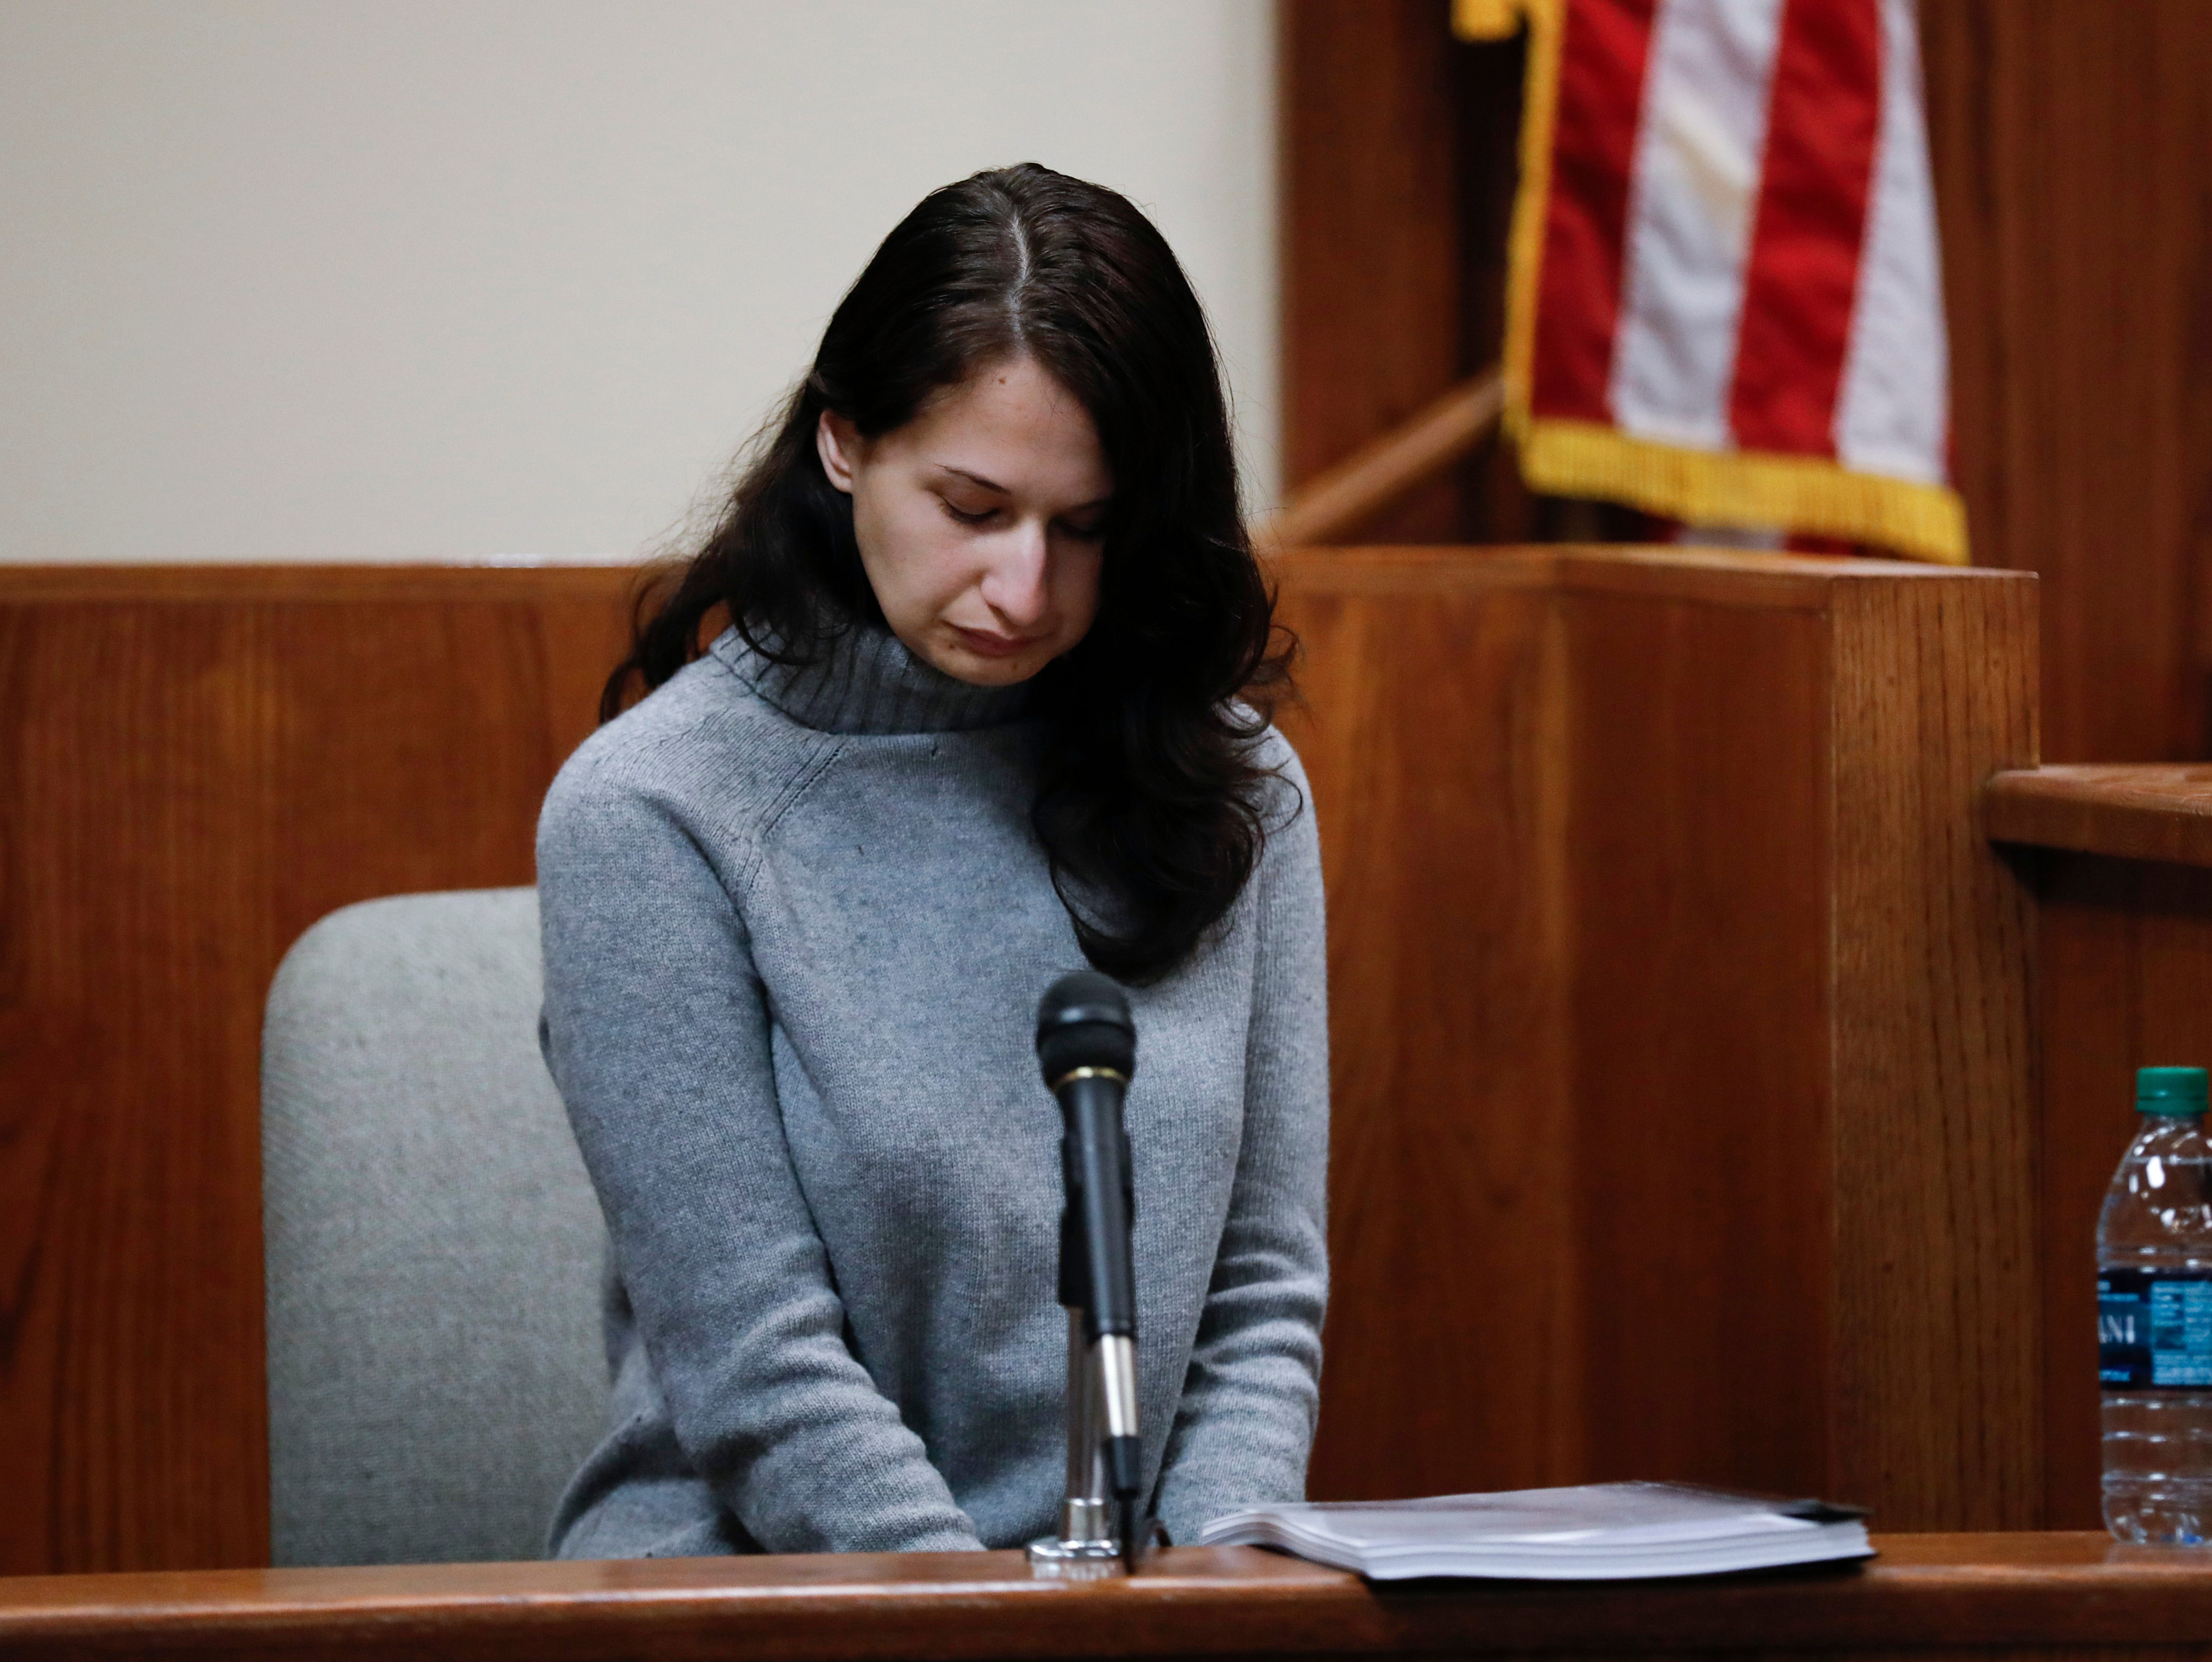 Gypsy Blanchard takes the stand in ex-boyfriend's murder trial